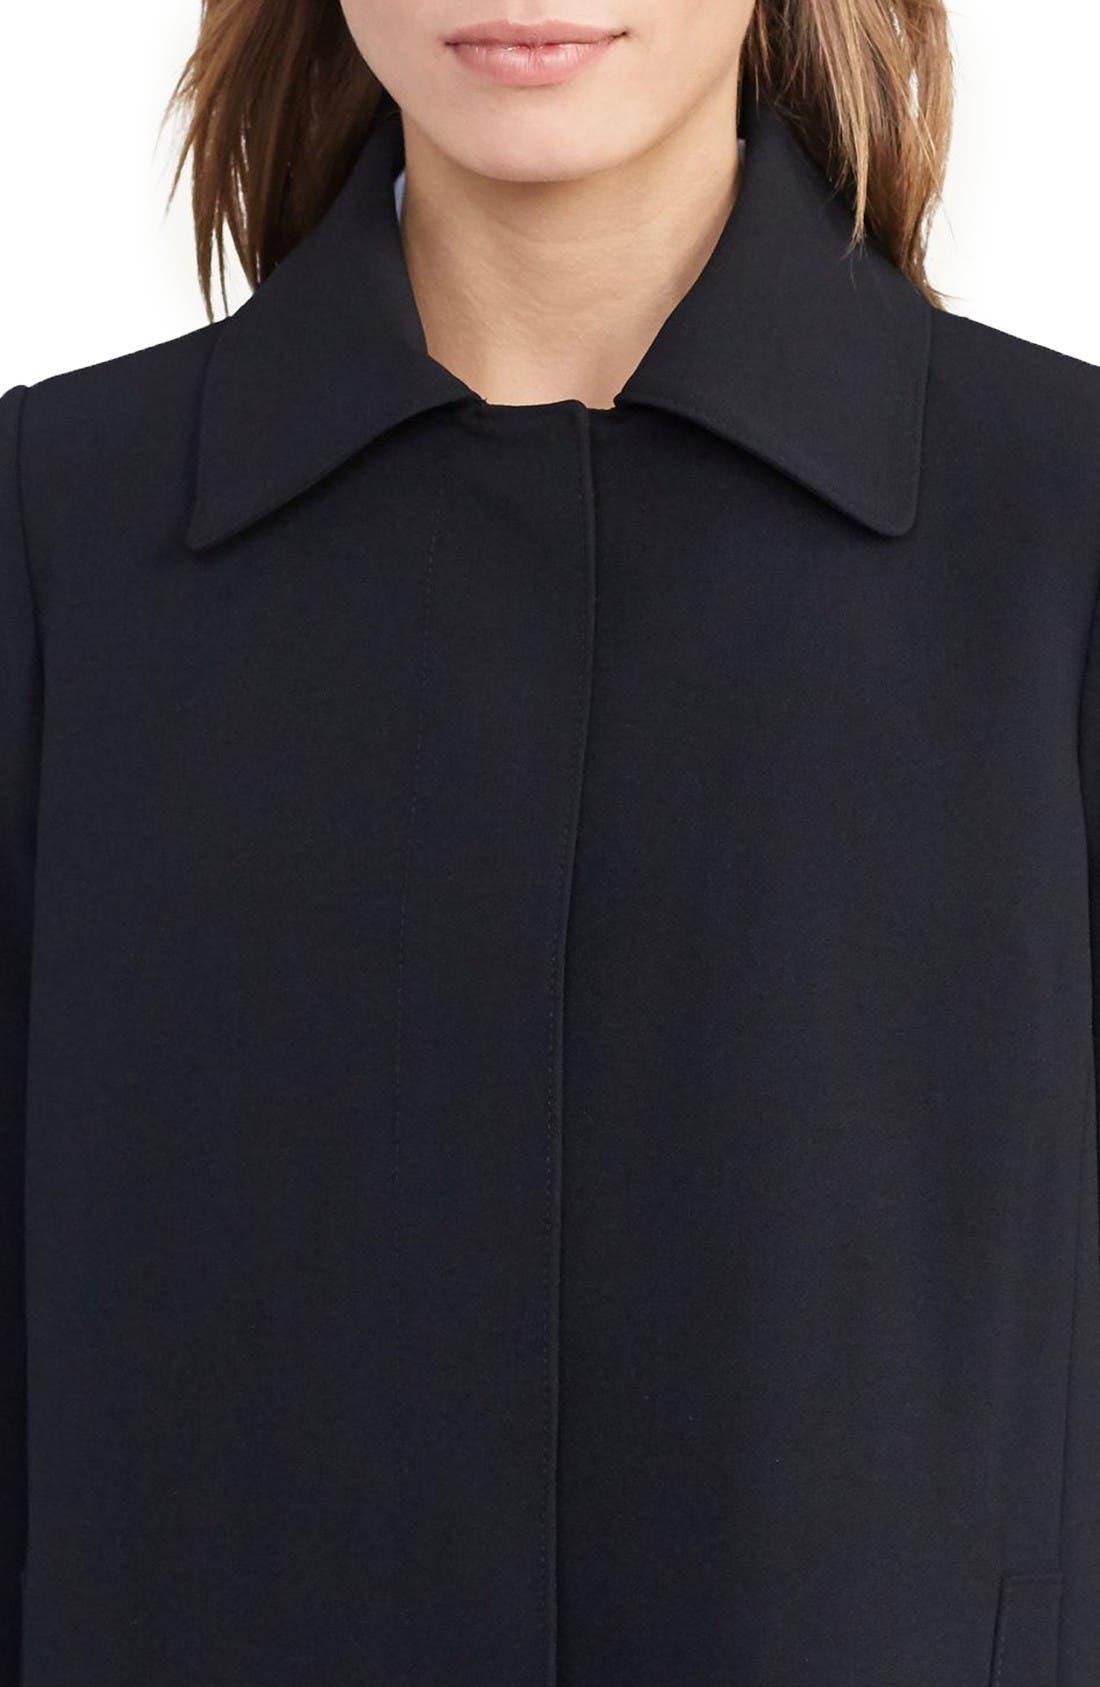 Crepe Jacket,                             Alternate thumbnail 3, color,                             Black